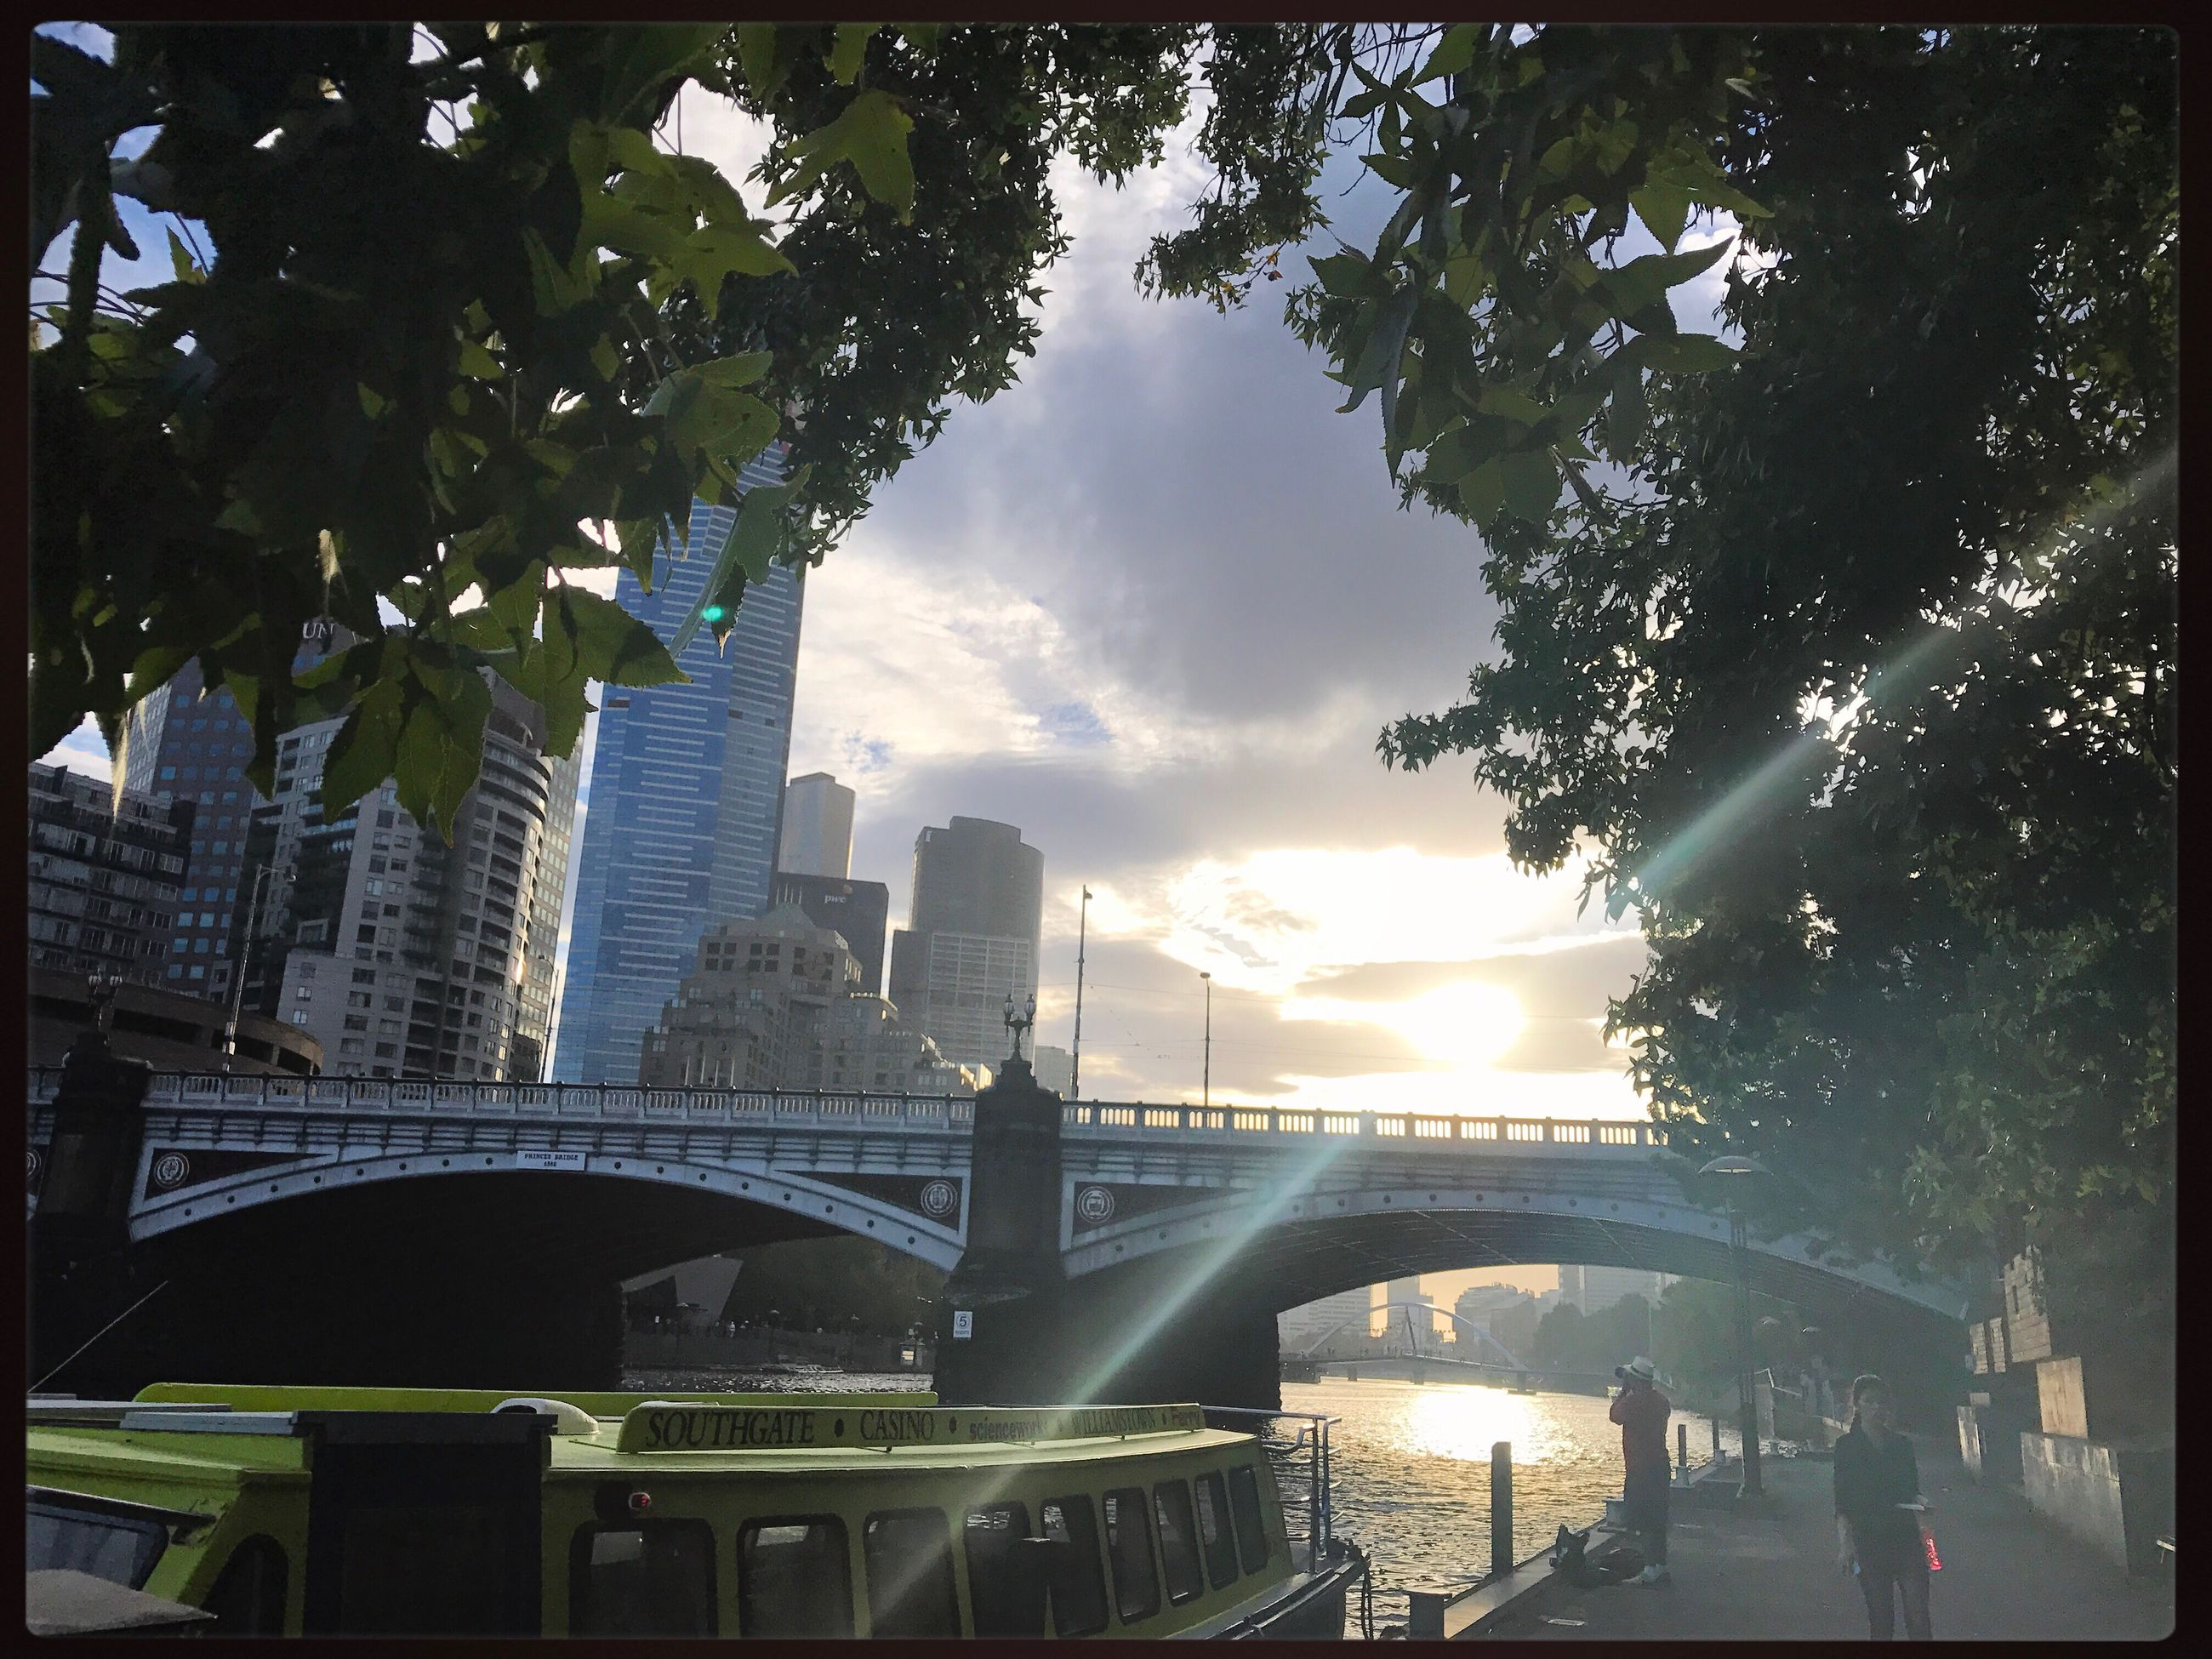 city, travel destinations, architecture, tree, travel, cityscape, sunset, outdoors, modern, skyscraper, urban skyline, sky, no people, day